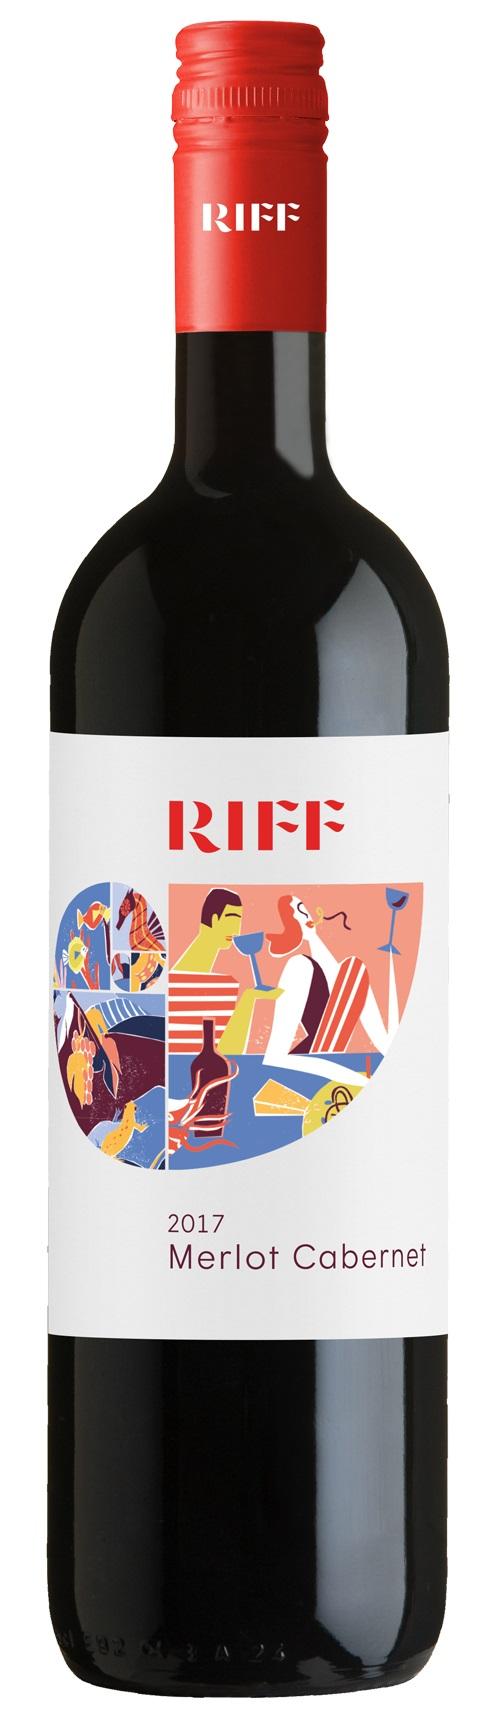 RIFF Merlot Cabernet